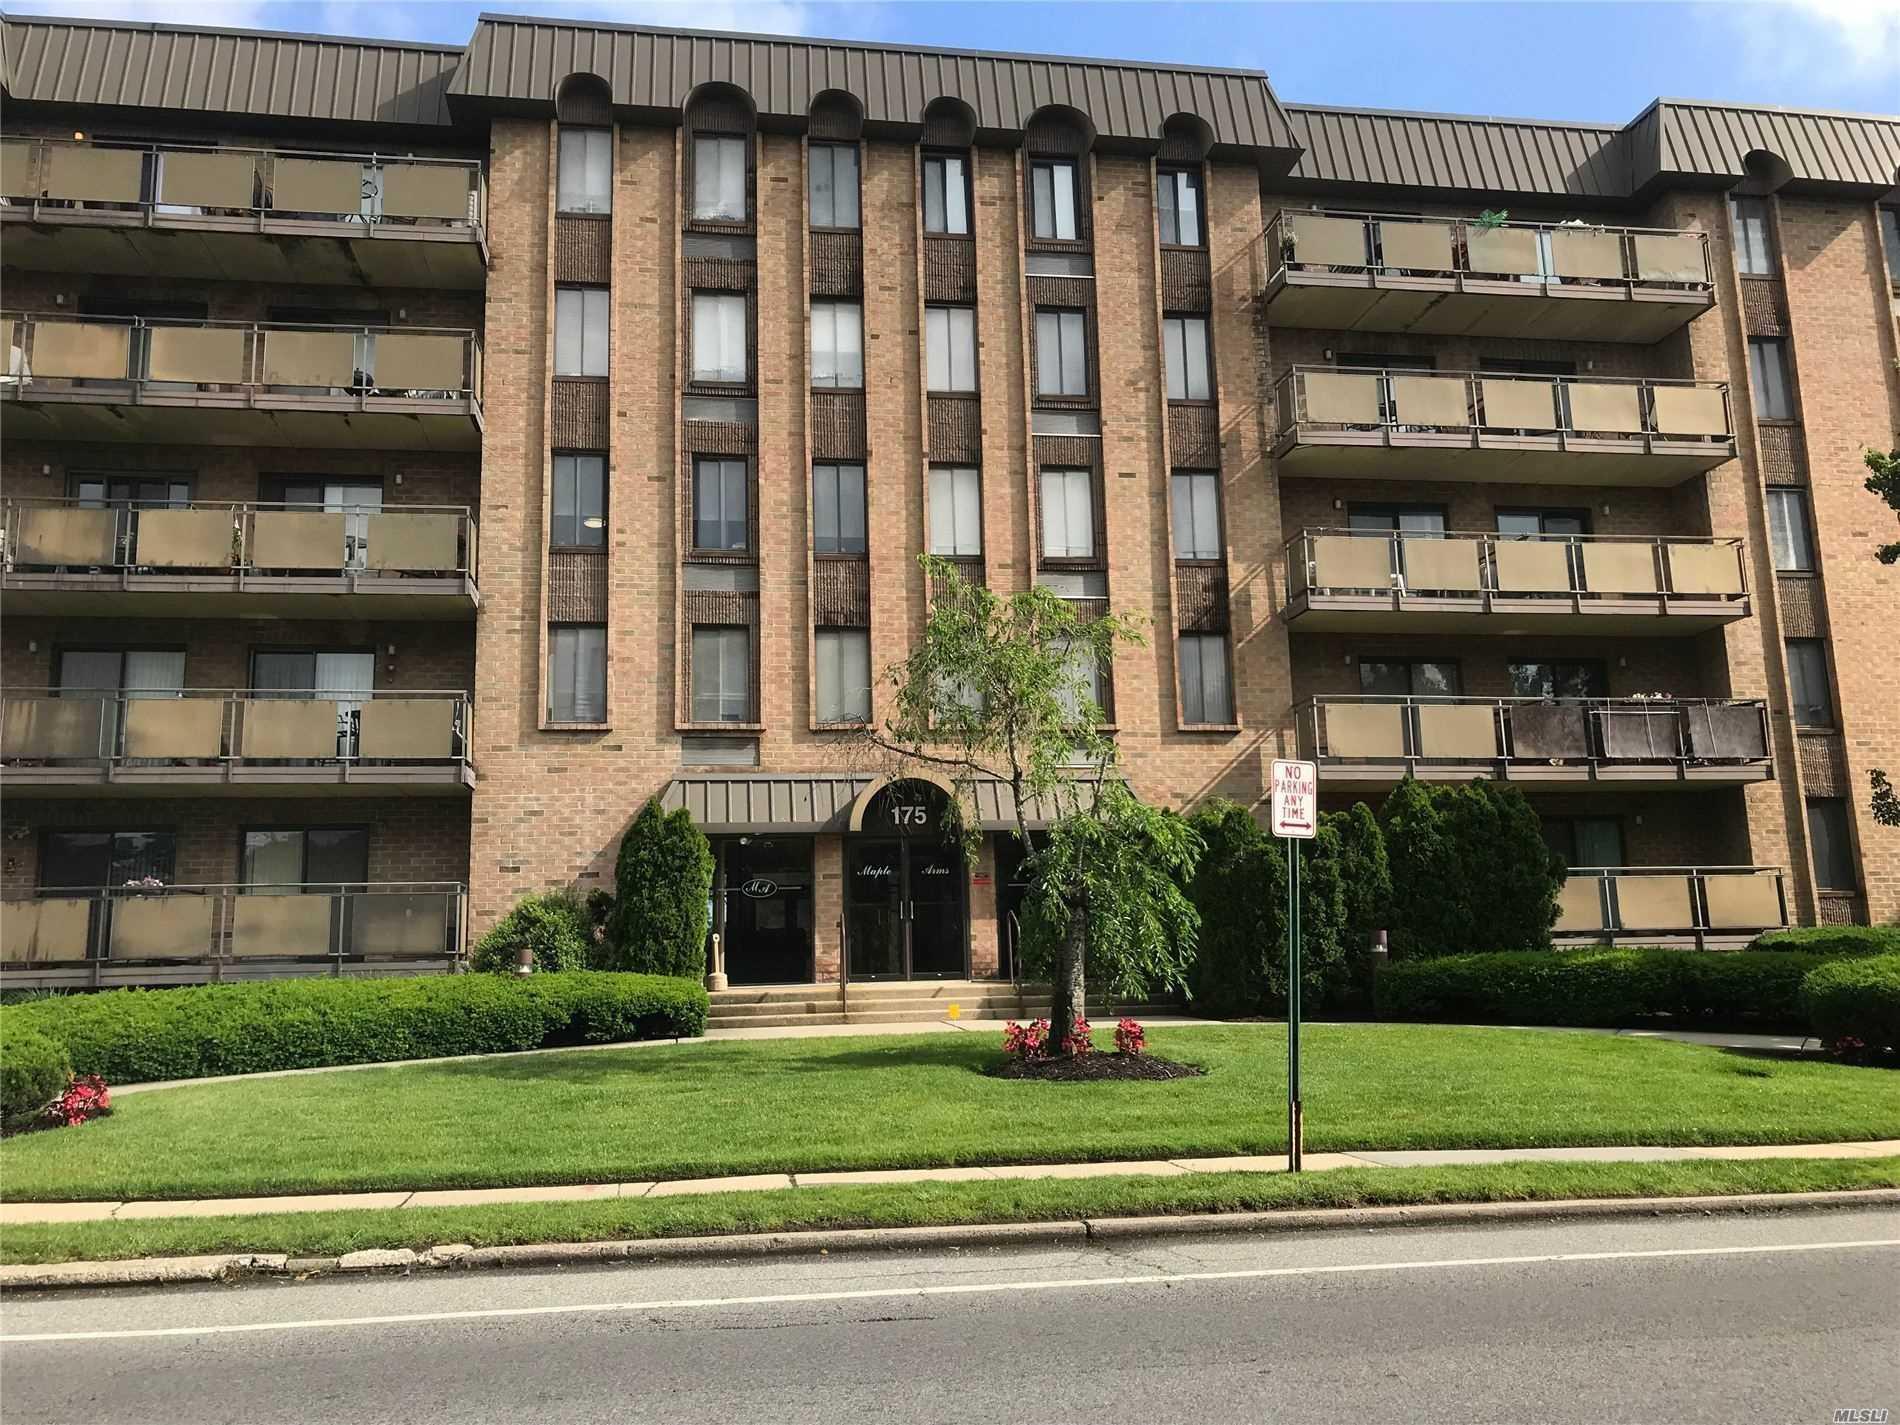 Property for sale at 175 Maple Avenue # l, Westbury NY 11590, Westbury,  New York 11590